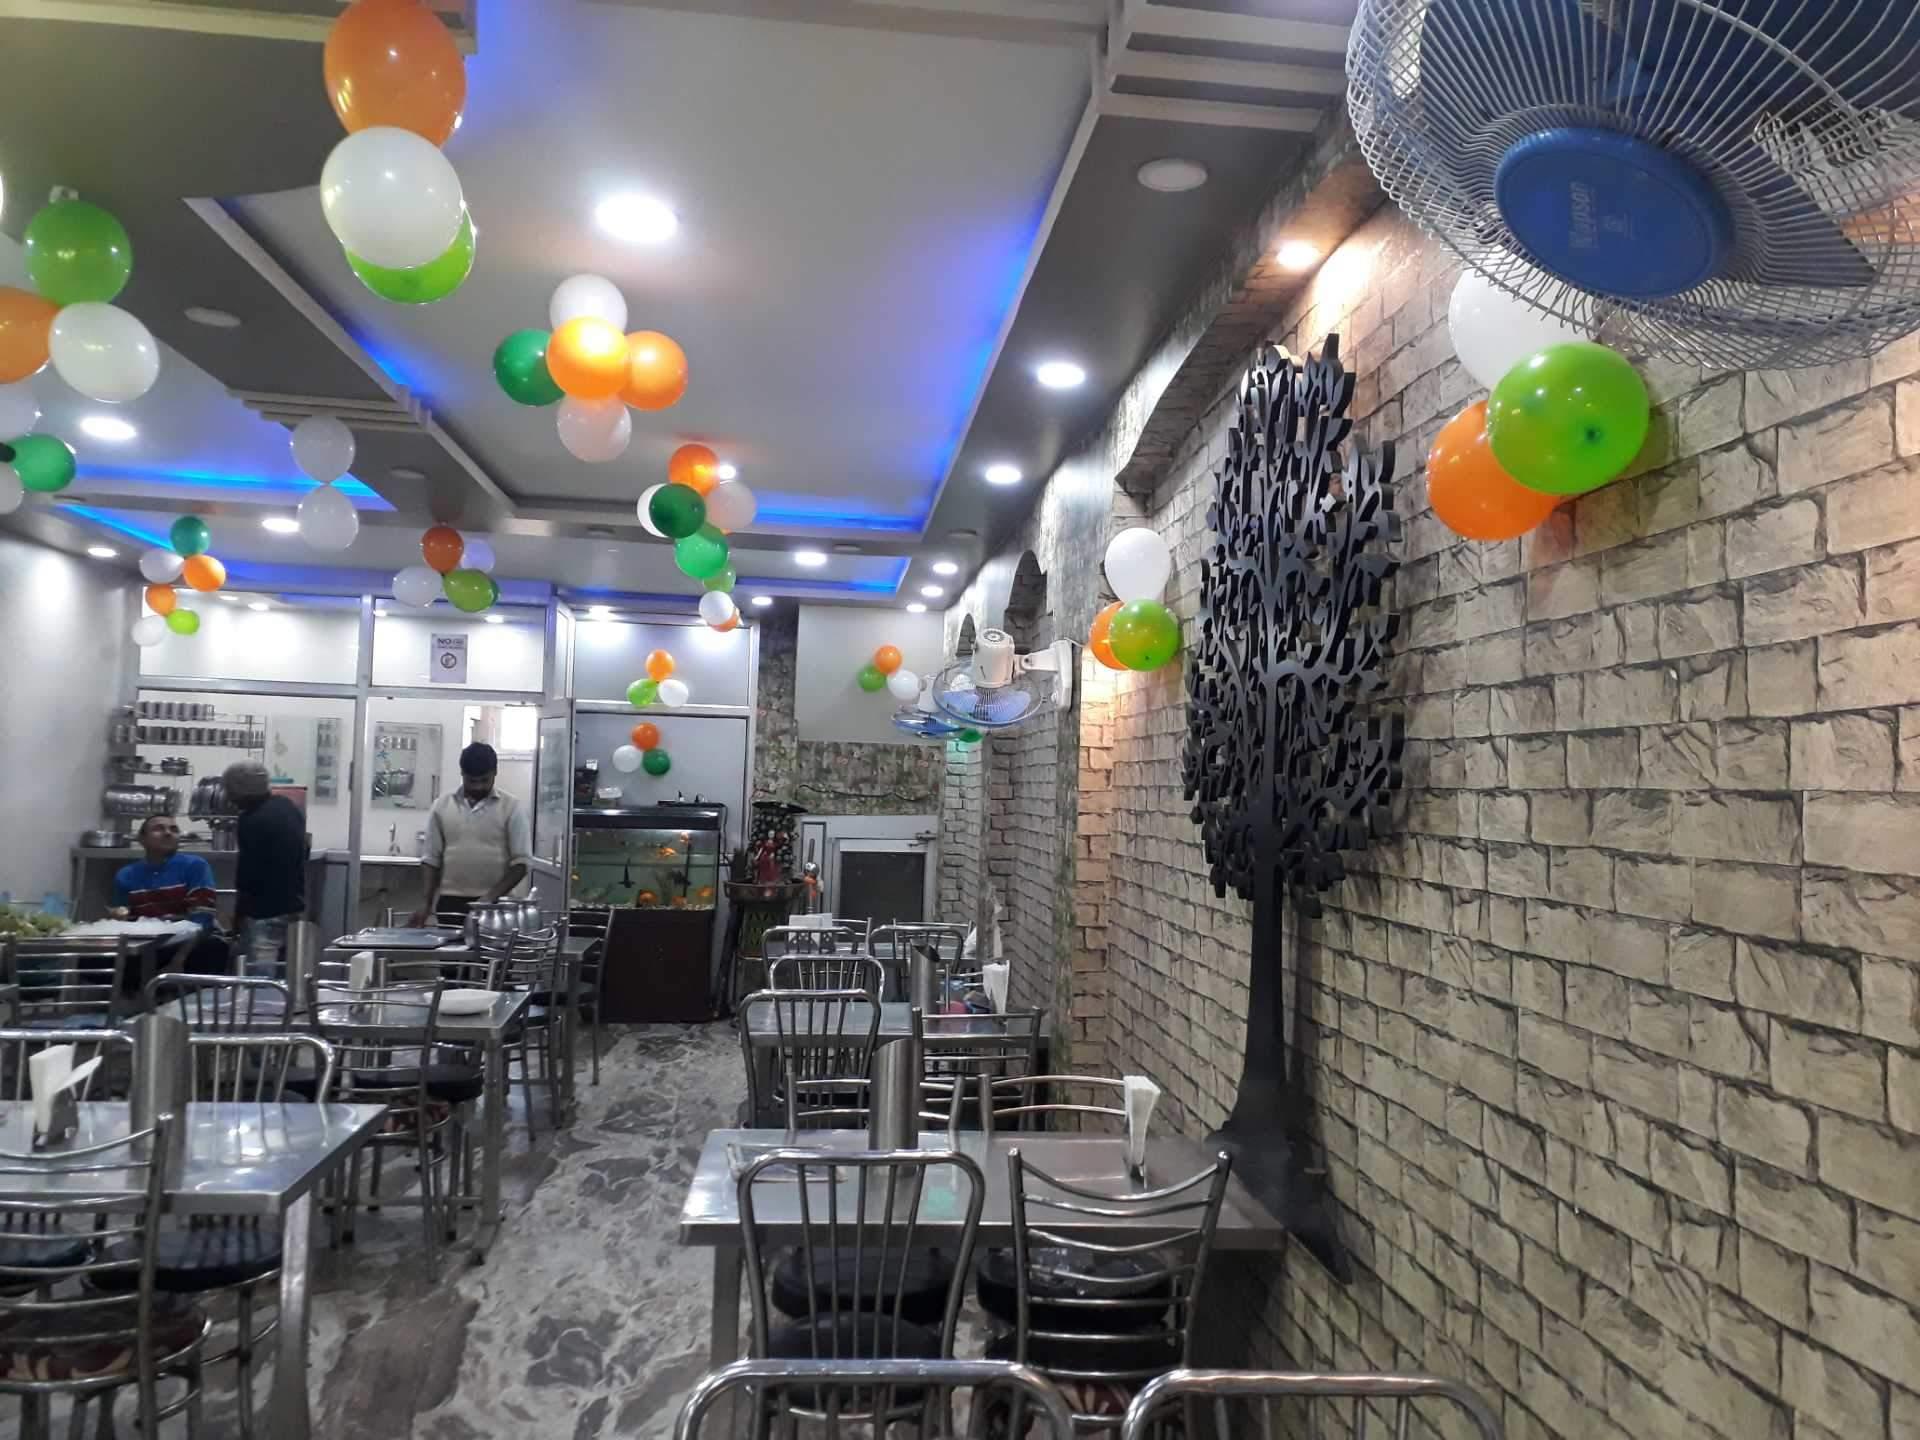 Biryani Restaurants in Abrar Nagar, Lucknow - Biriyani Restaurants